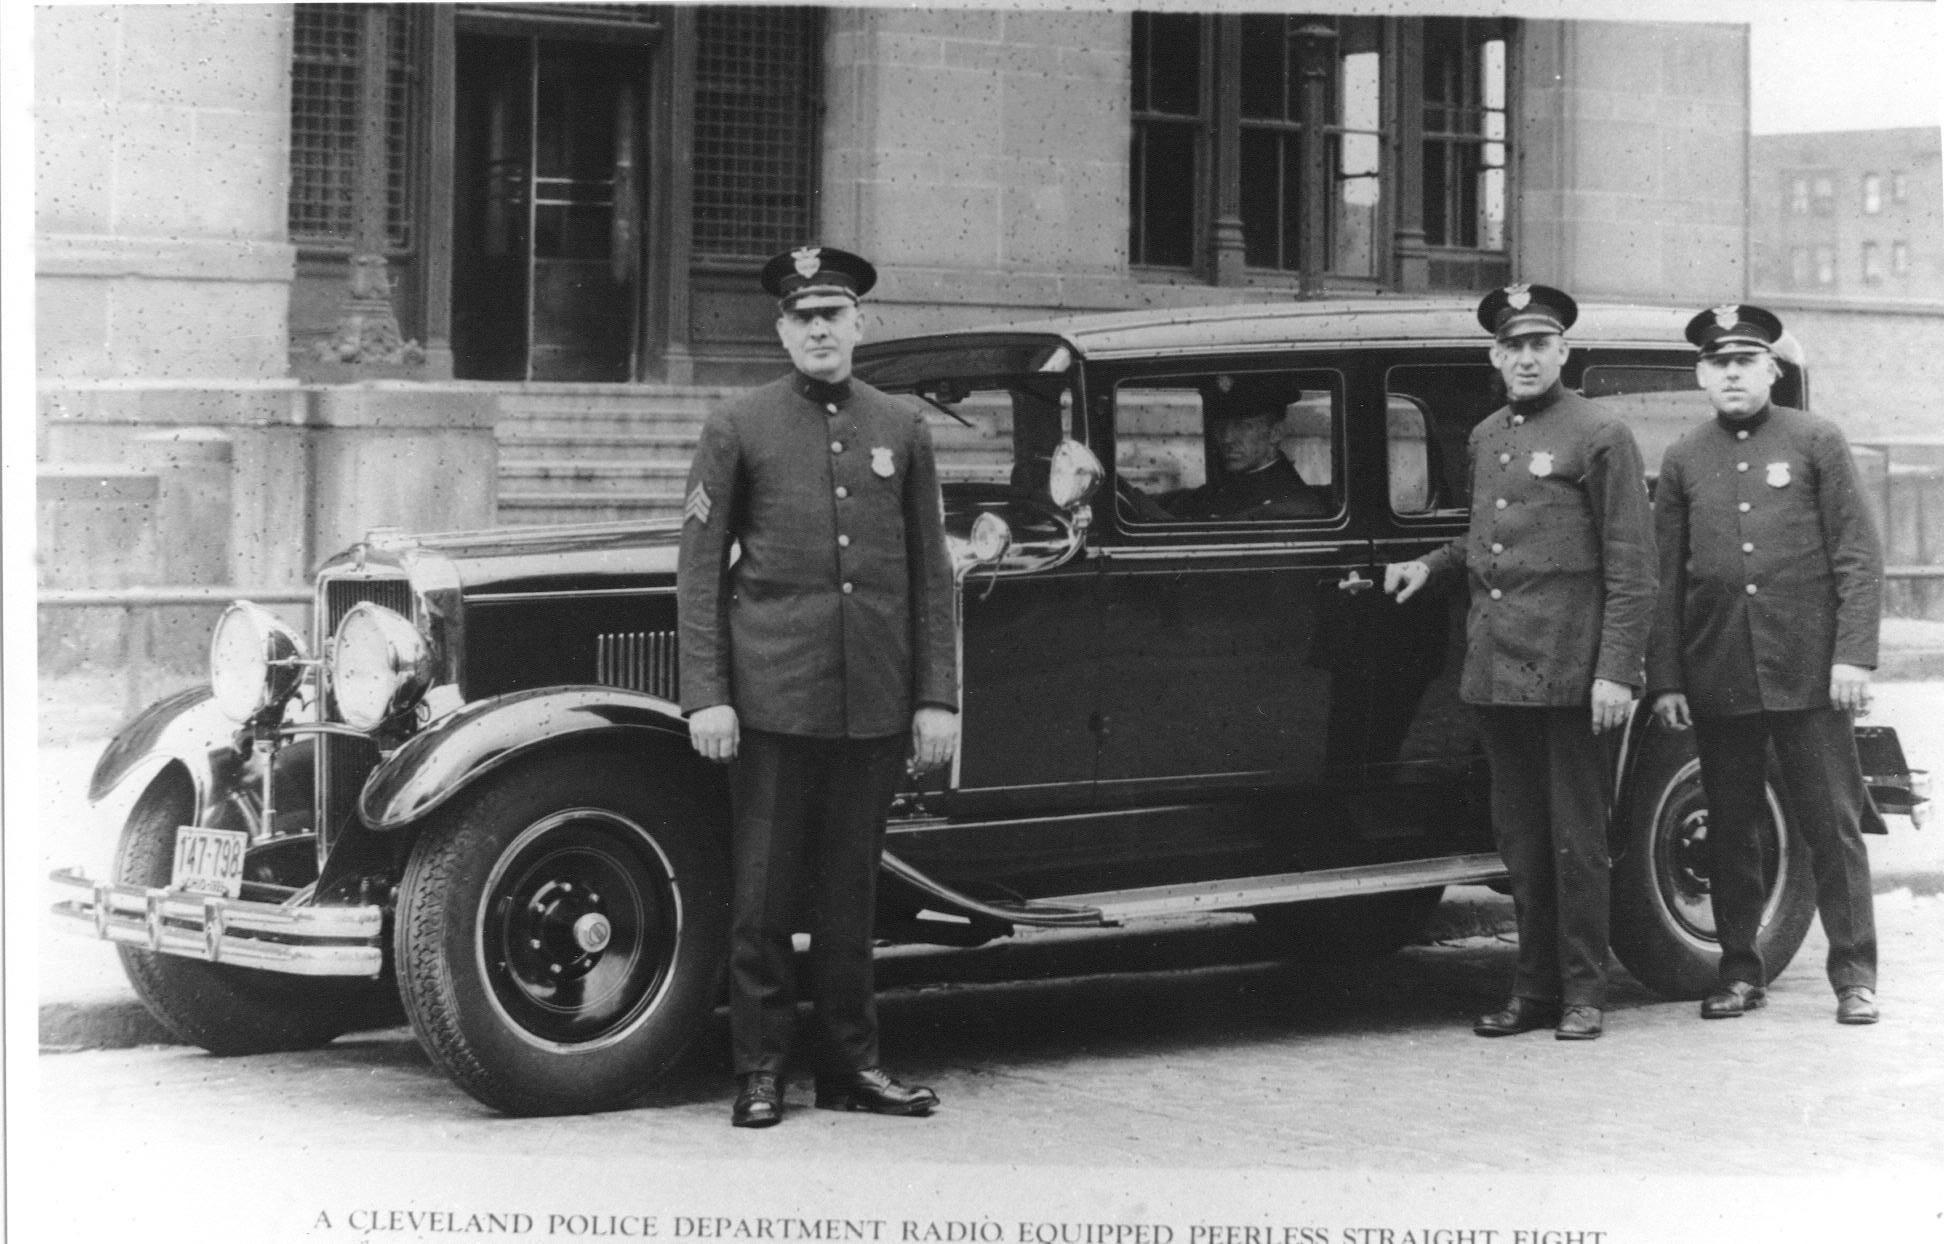 1990029006-Peerless-Model-125-Straight-8-Cleveland-Police-Radio-Equipped-Patrol-Car.jpg